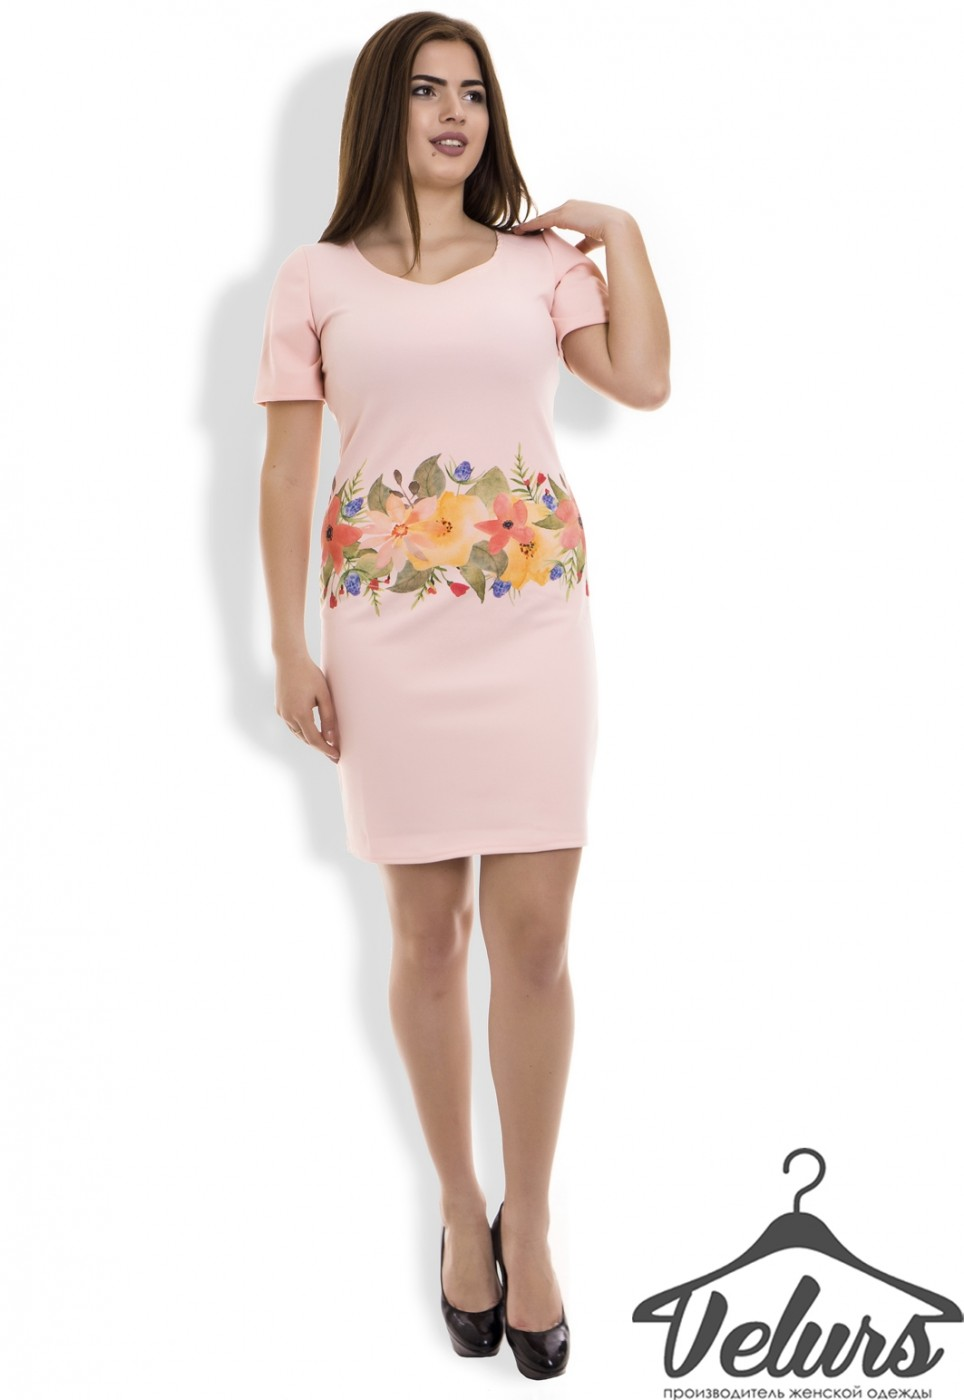 Velurs: Платье 212126 - фото 22